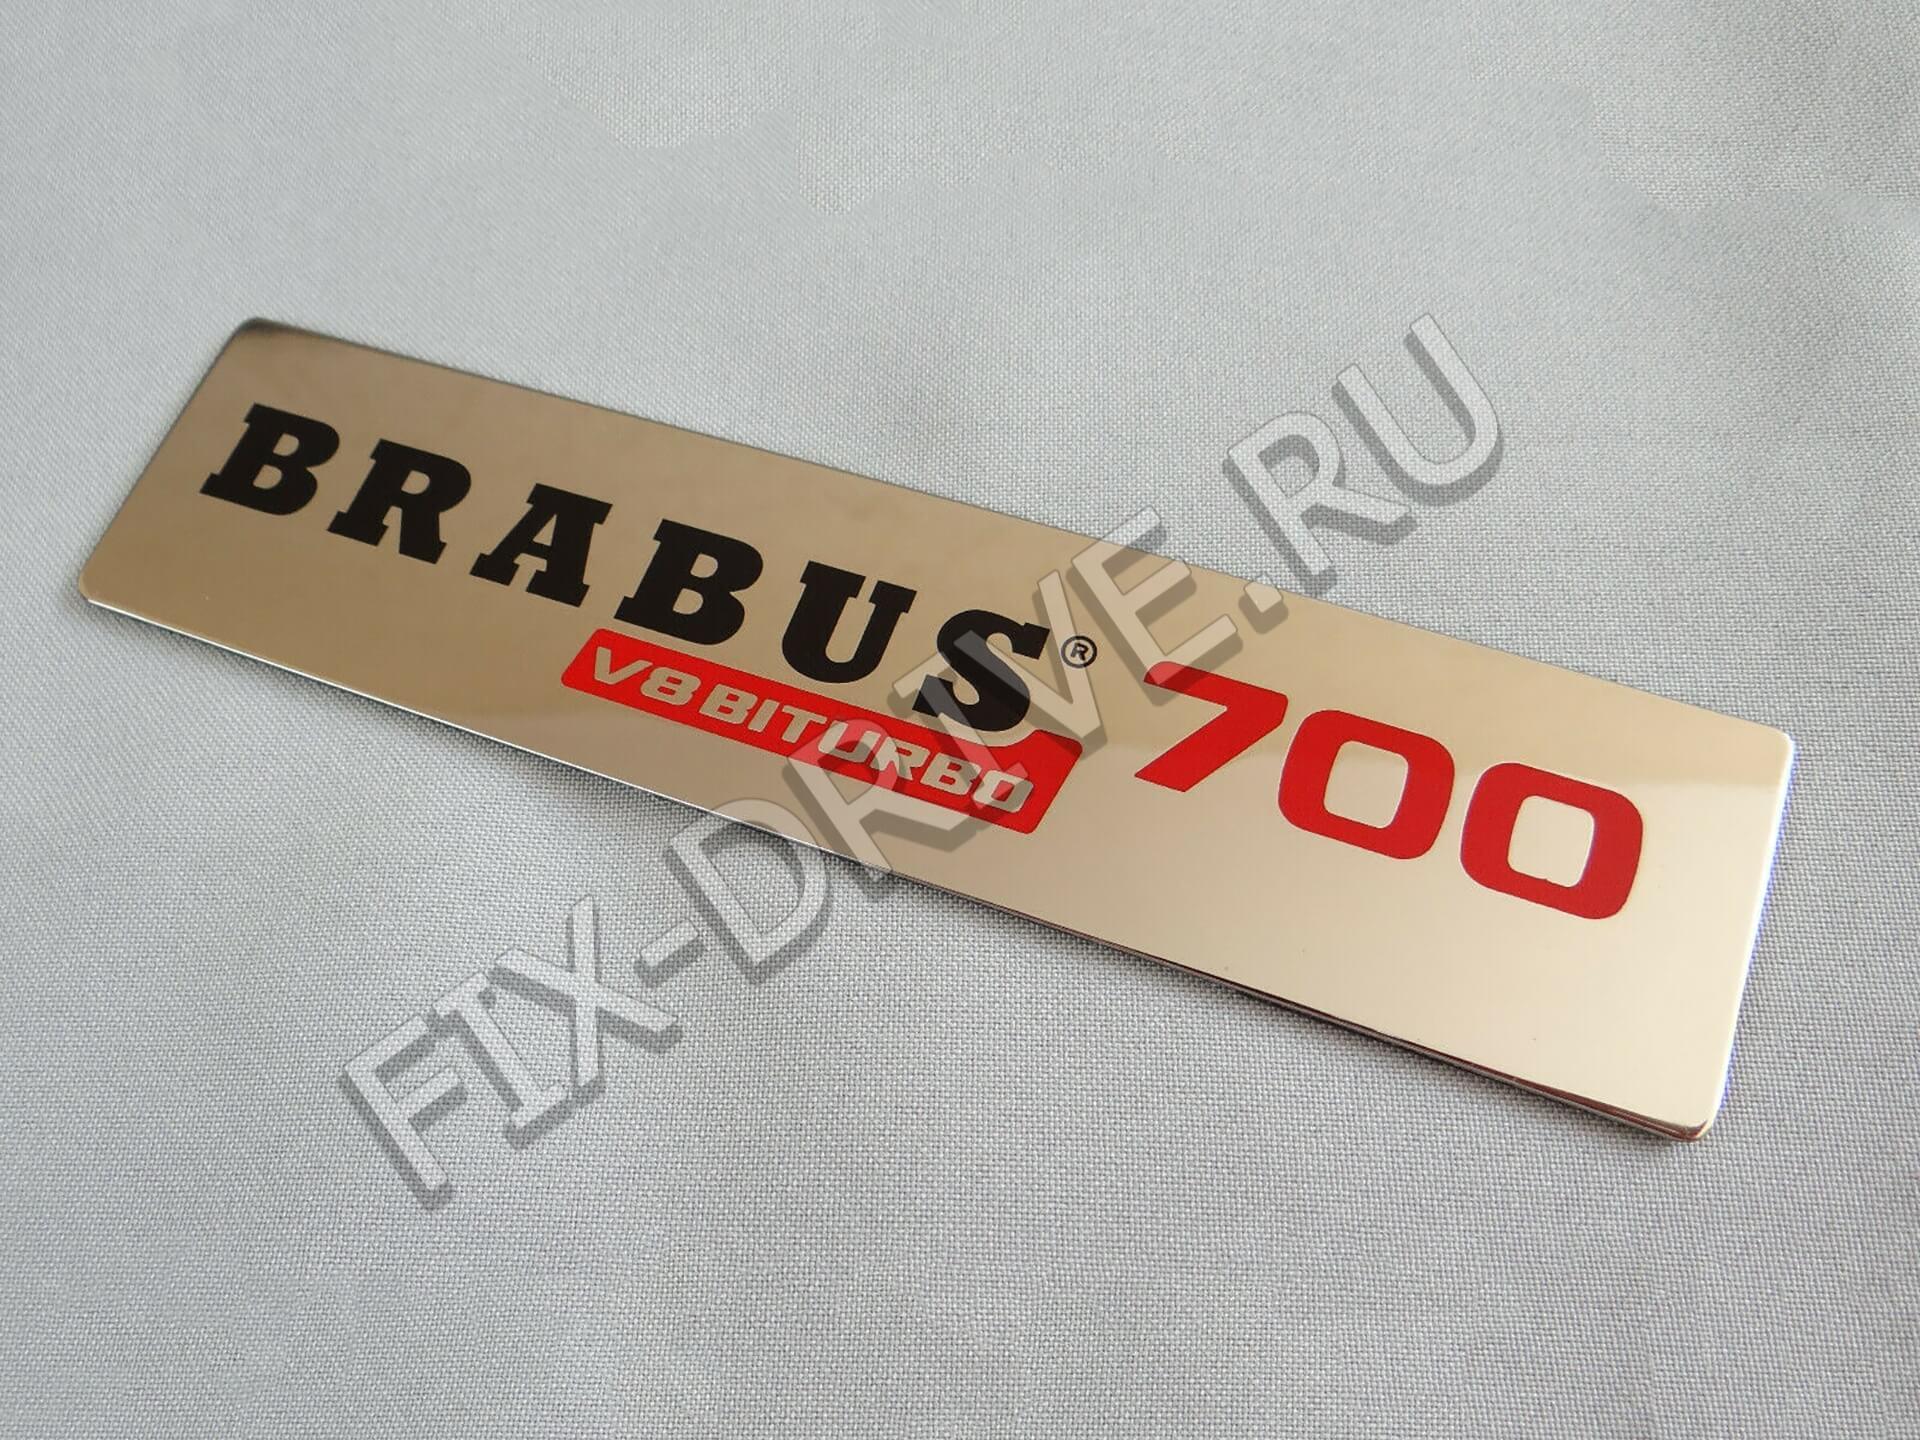 Эмблема V8 Biturbo Brabus 700